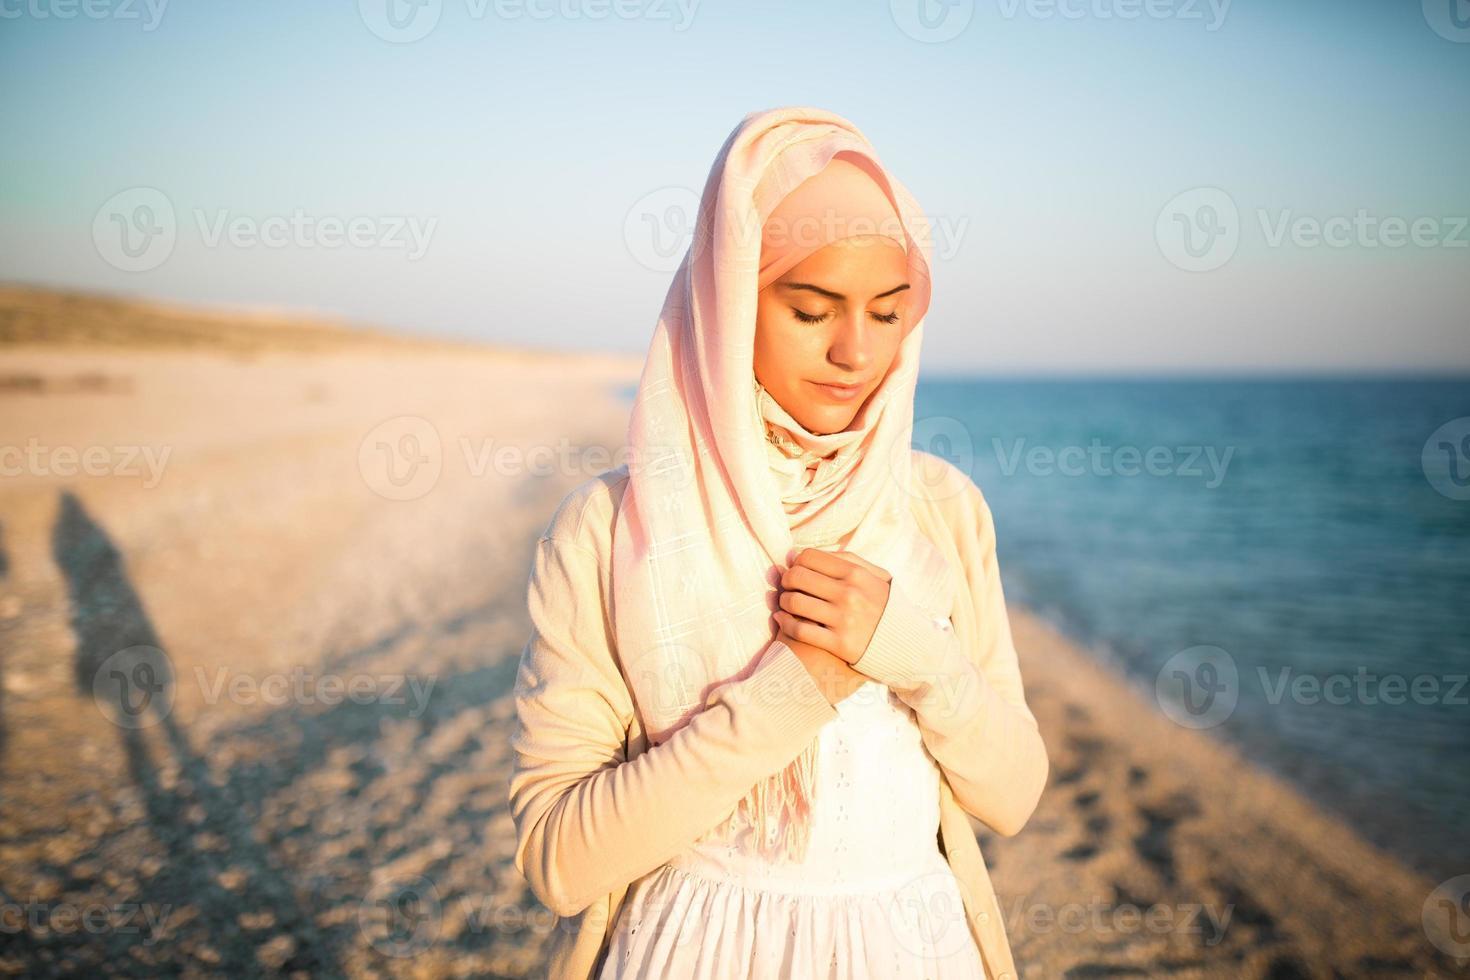 humilde mulher muçulmana rezando na mulher religiosa beach.spiritual foto